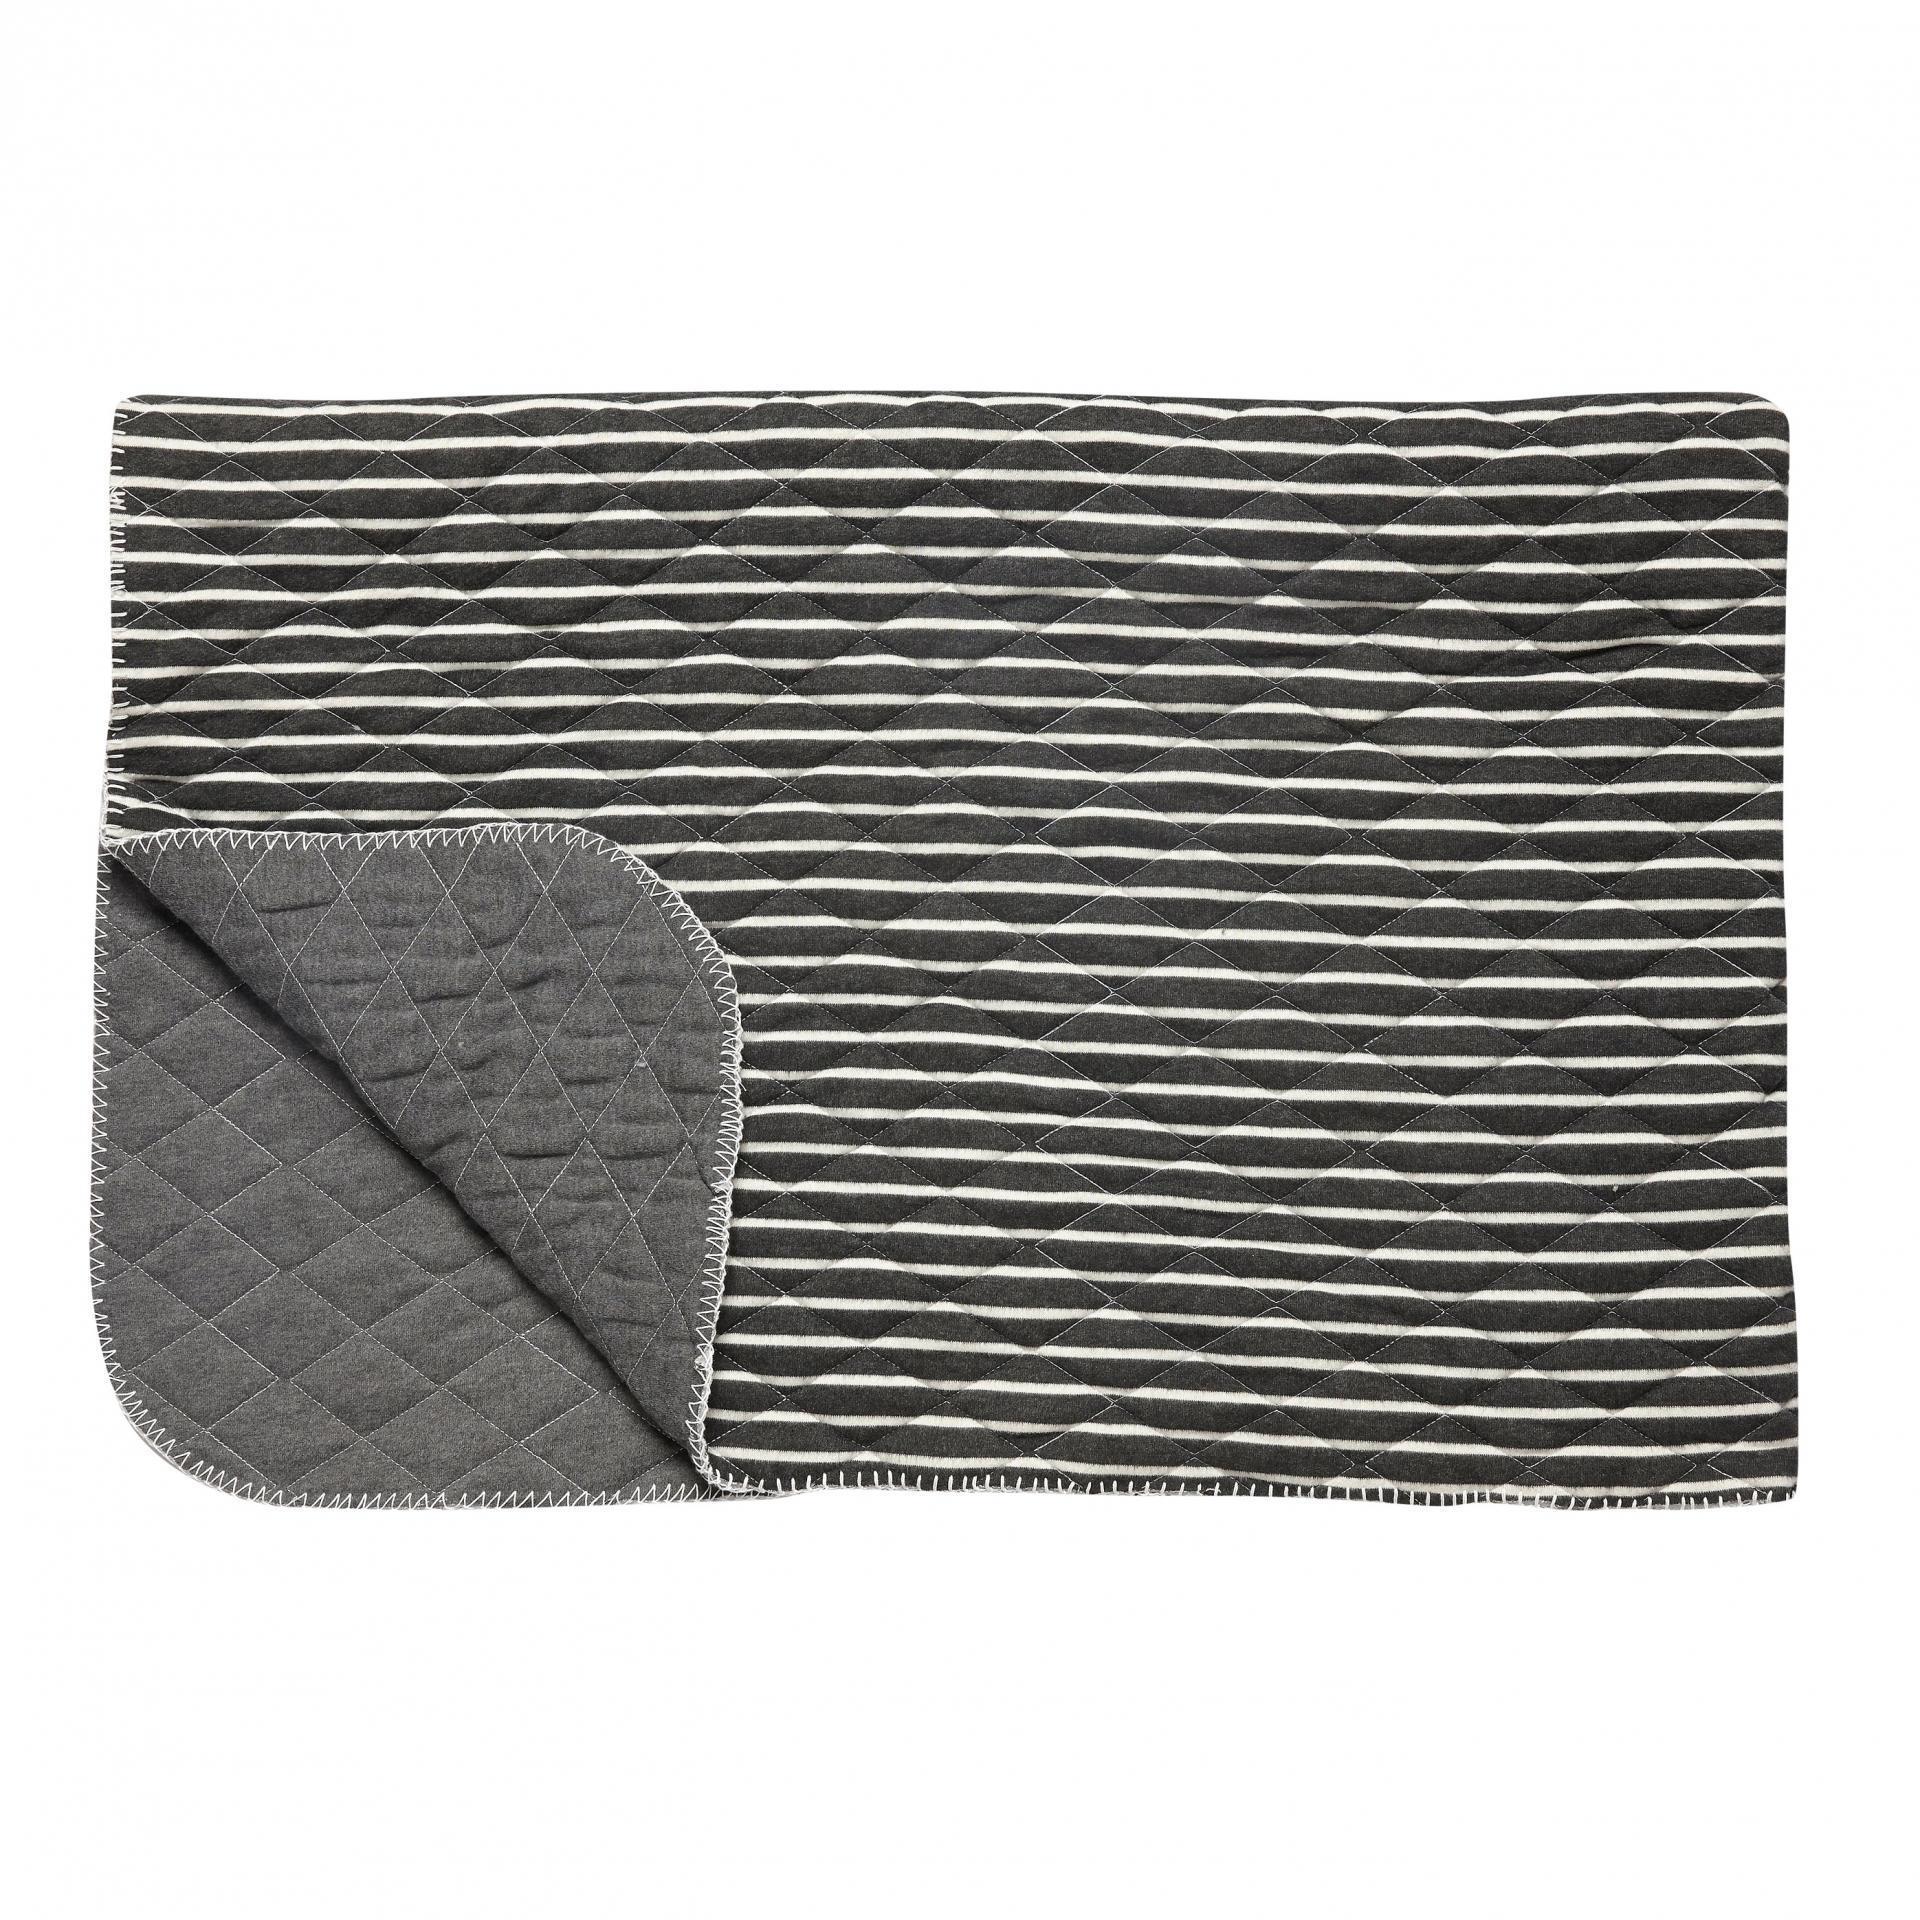 Hübsch Pléd Grey stripes 165x110 cm c2e6575c4e